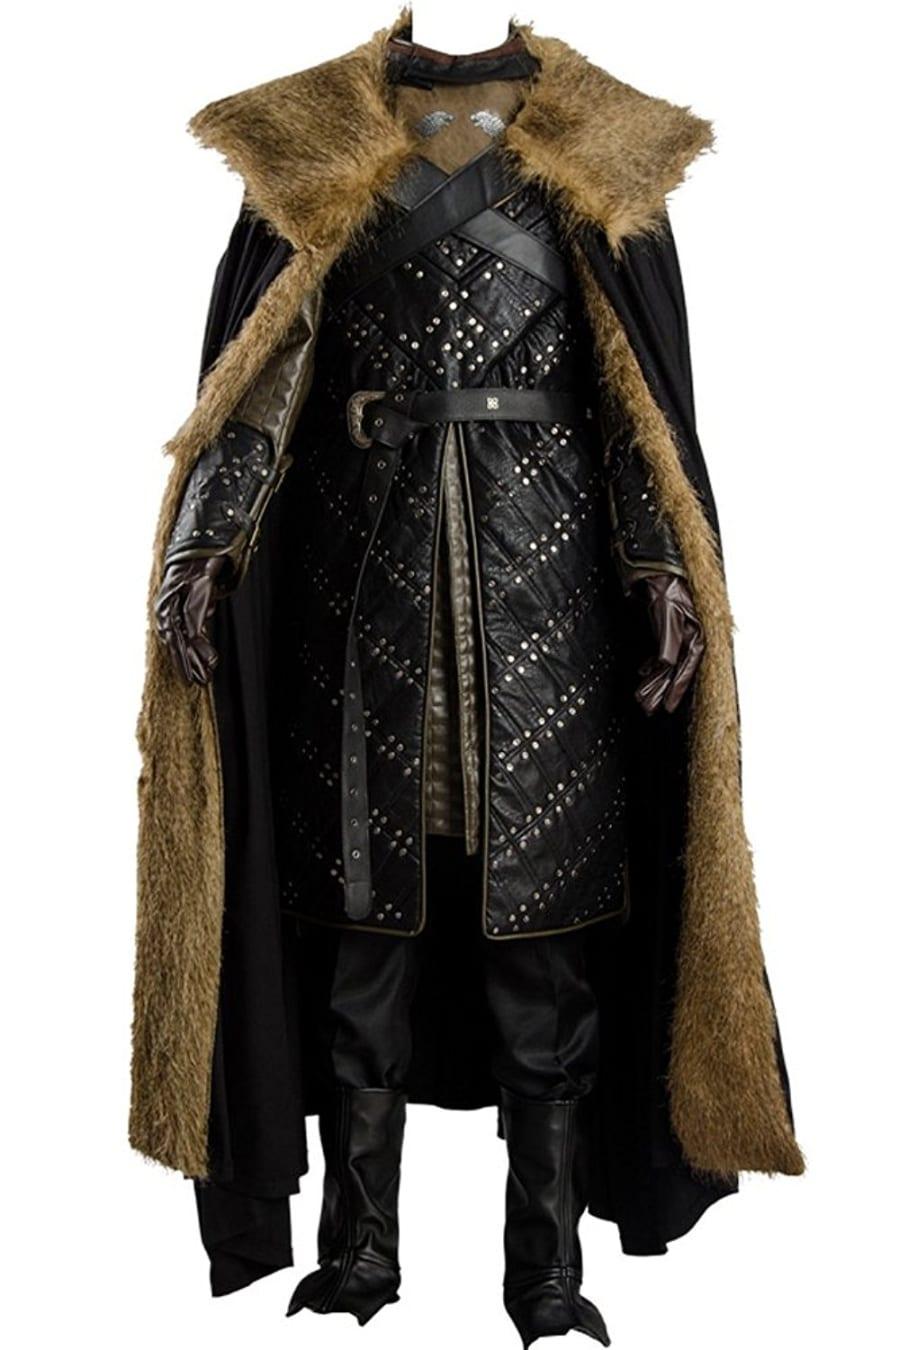 Game Of Thrones Season 7 Jon Snow Armor Costume 7 Gadgets